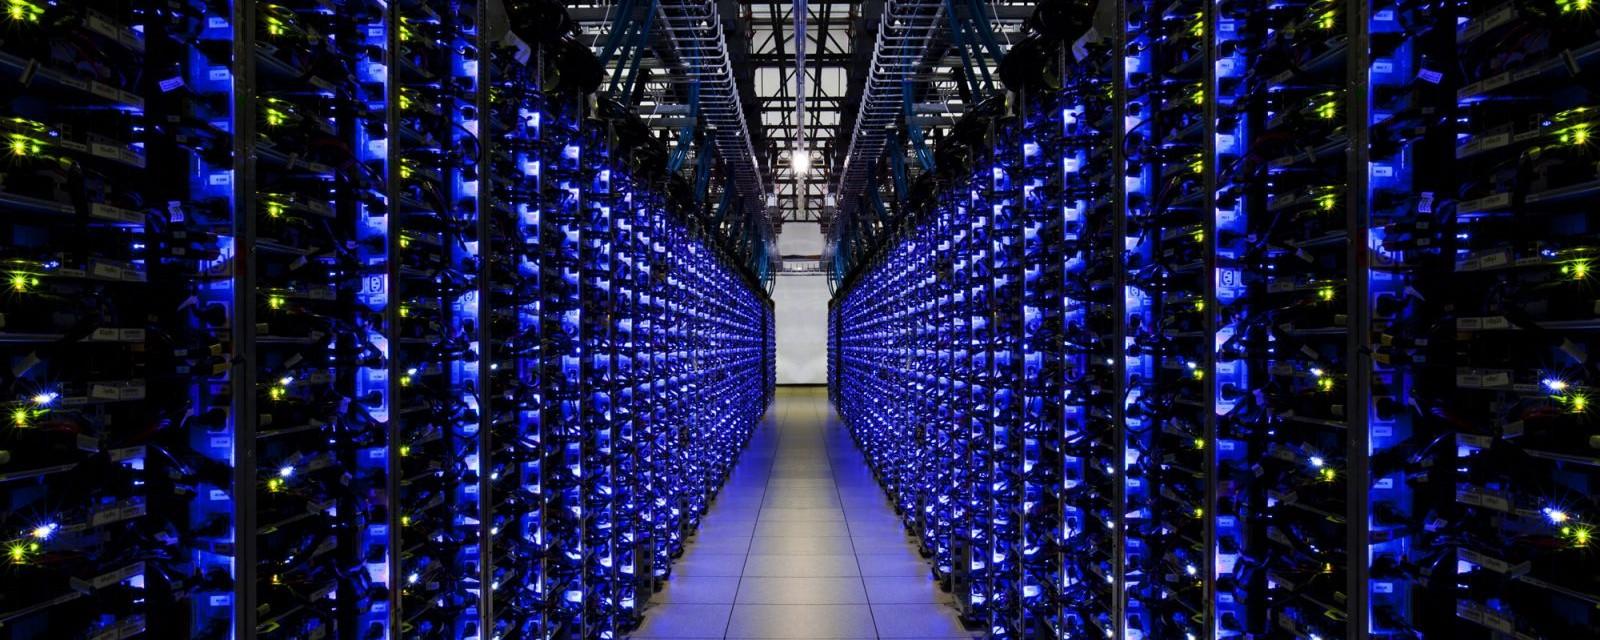 Storage of Critical Information Using Windows Server Backup Program